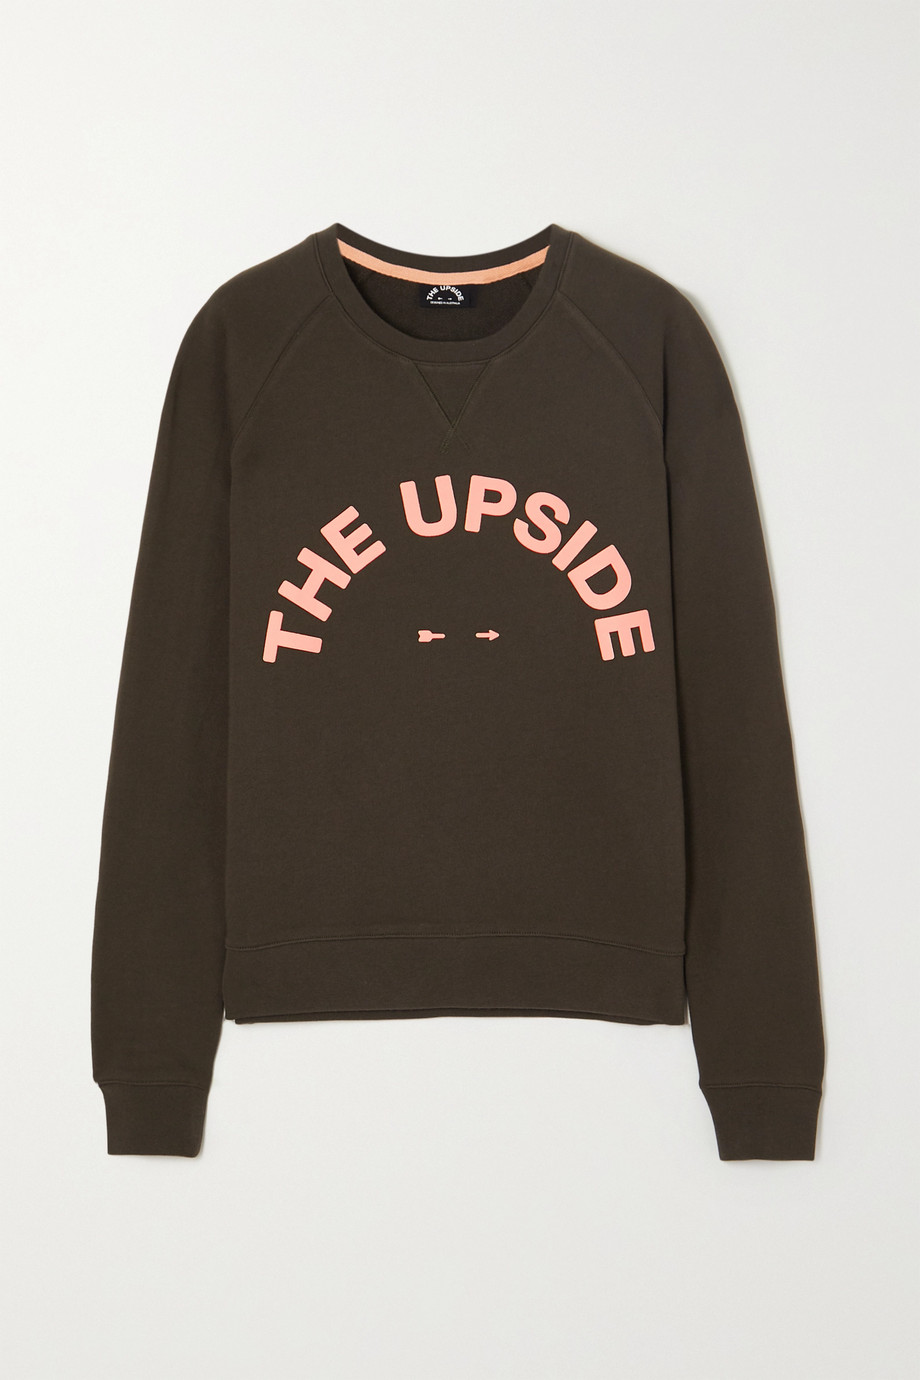 The Upside Bondi Crew printed cotton-terry sweatshirt